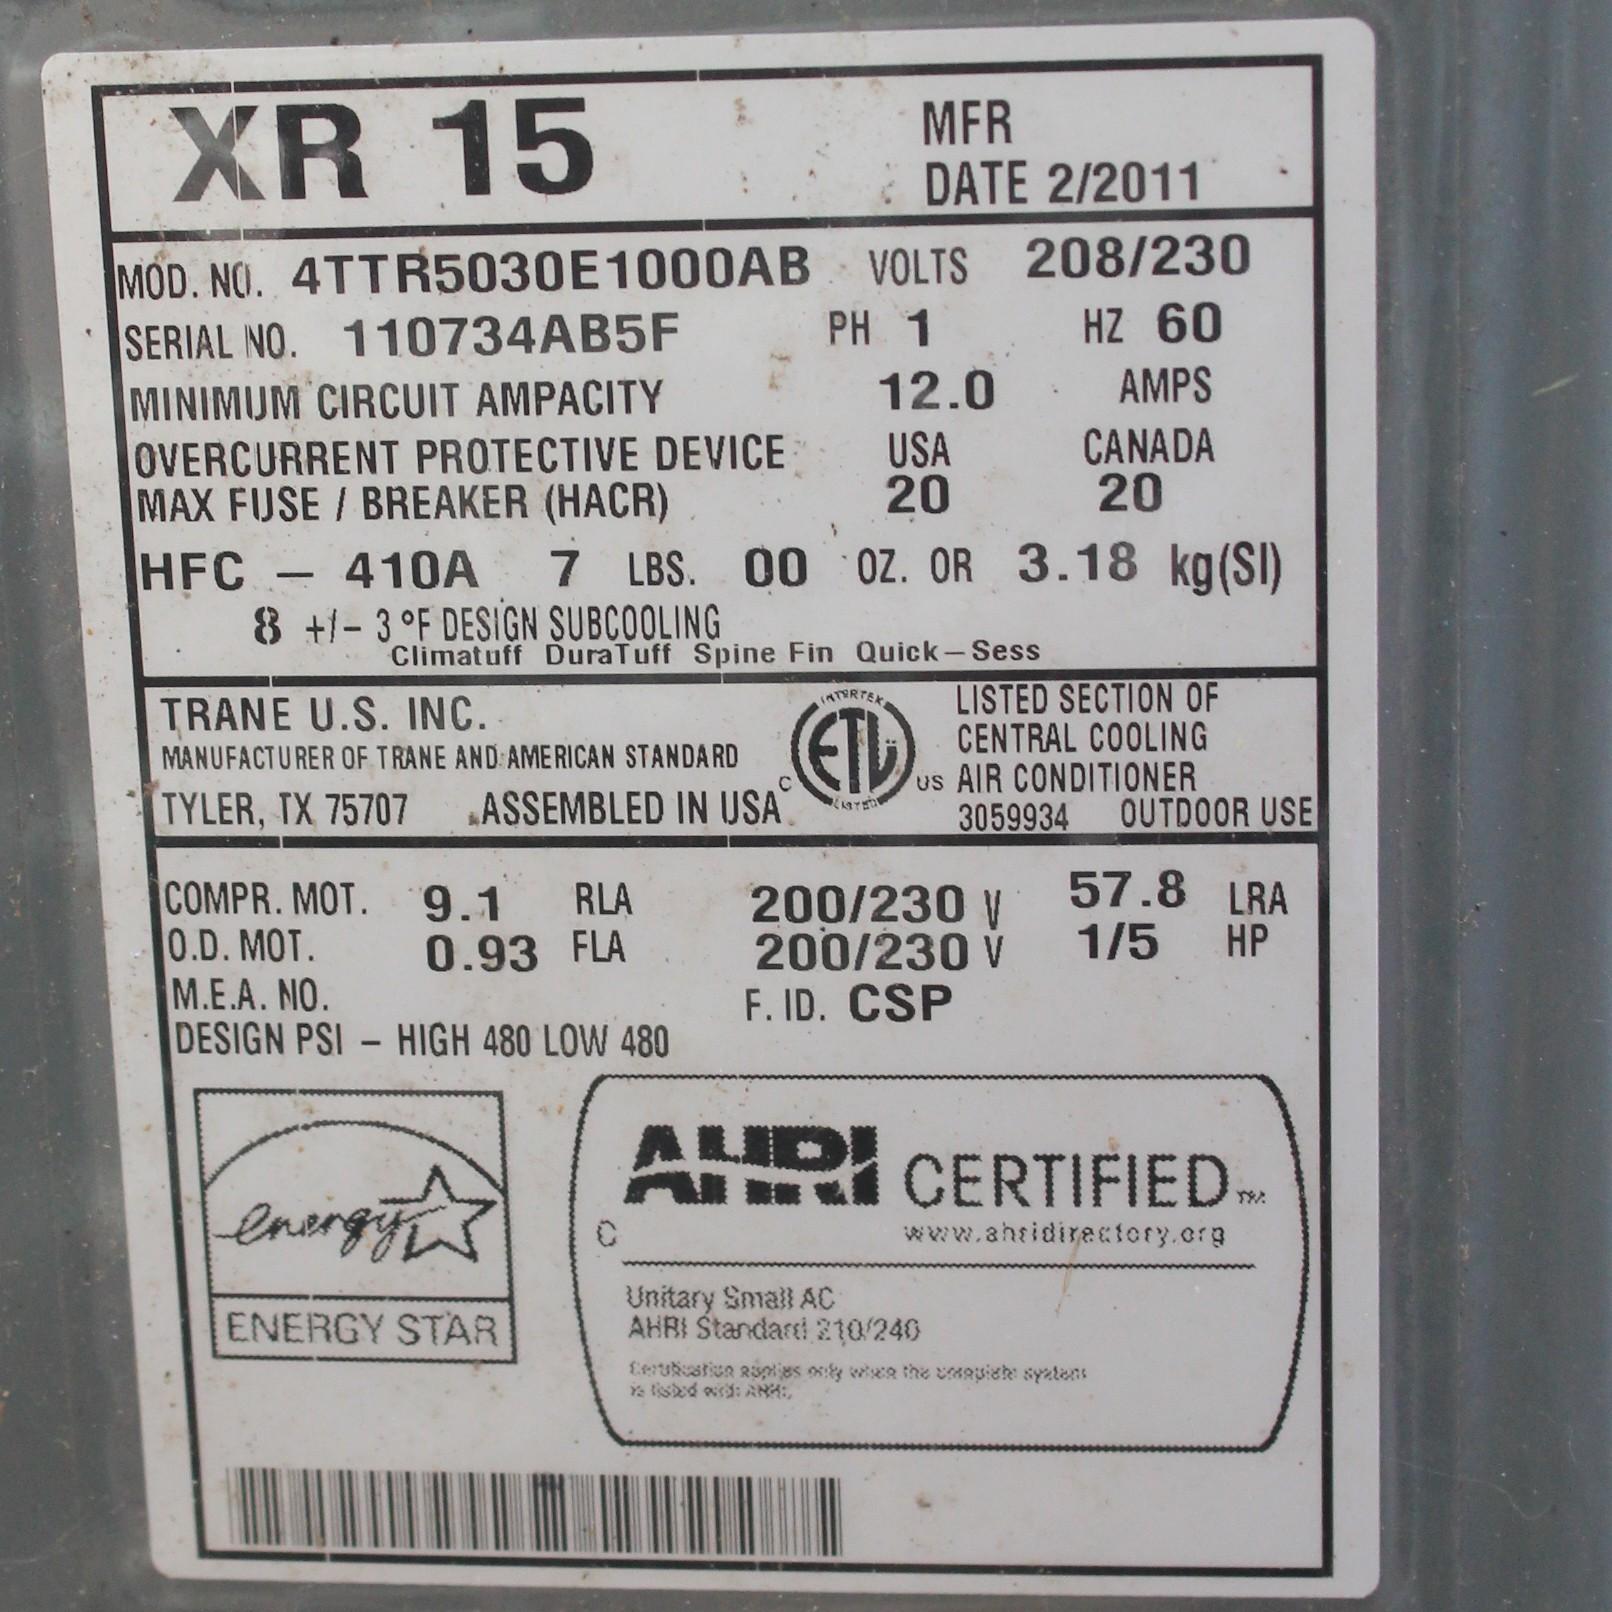 Summit Refrigerator Wiring Diagram Acr410refrigerant Al S Plumbing Heating Amp Air Conditioning